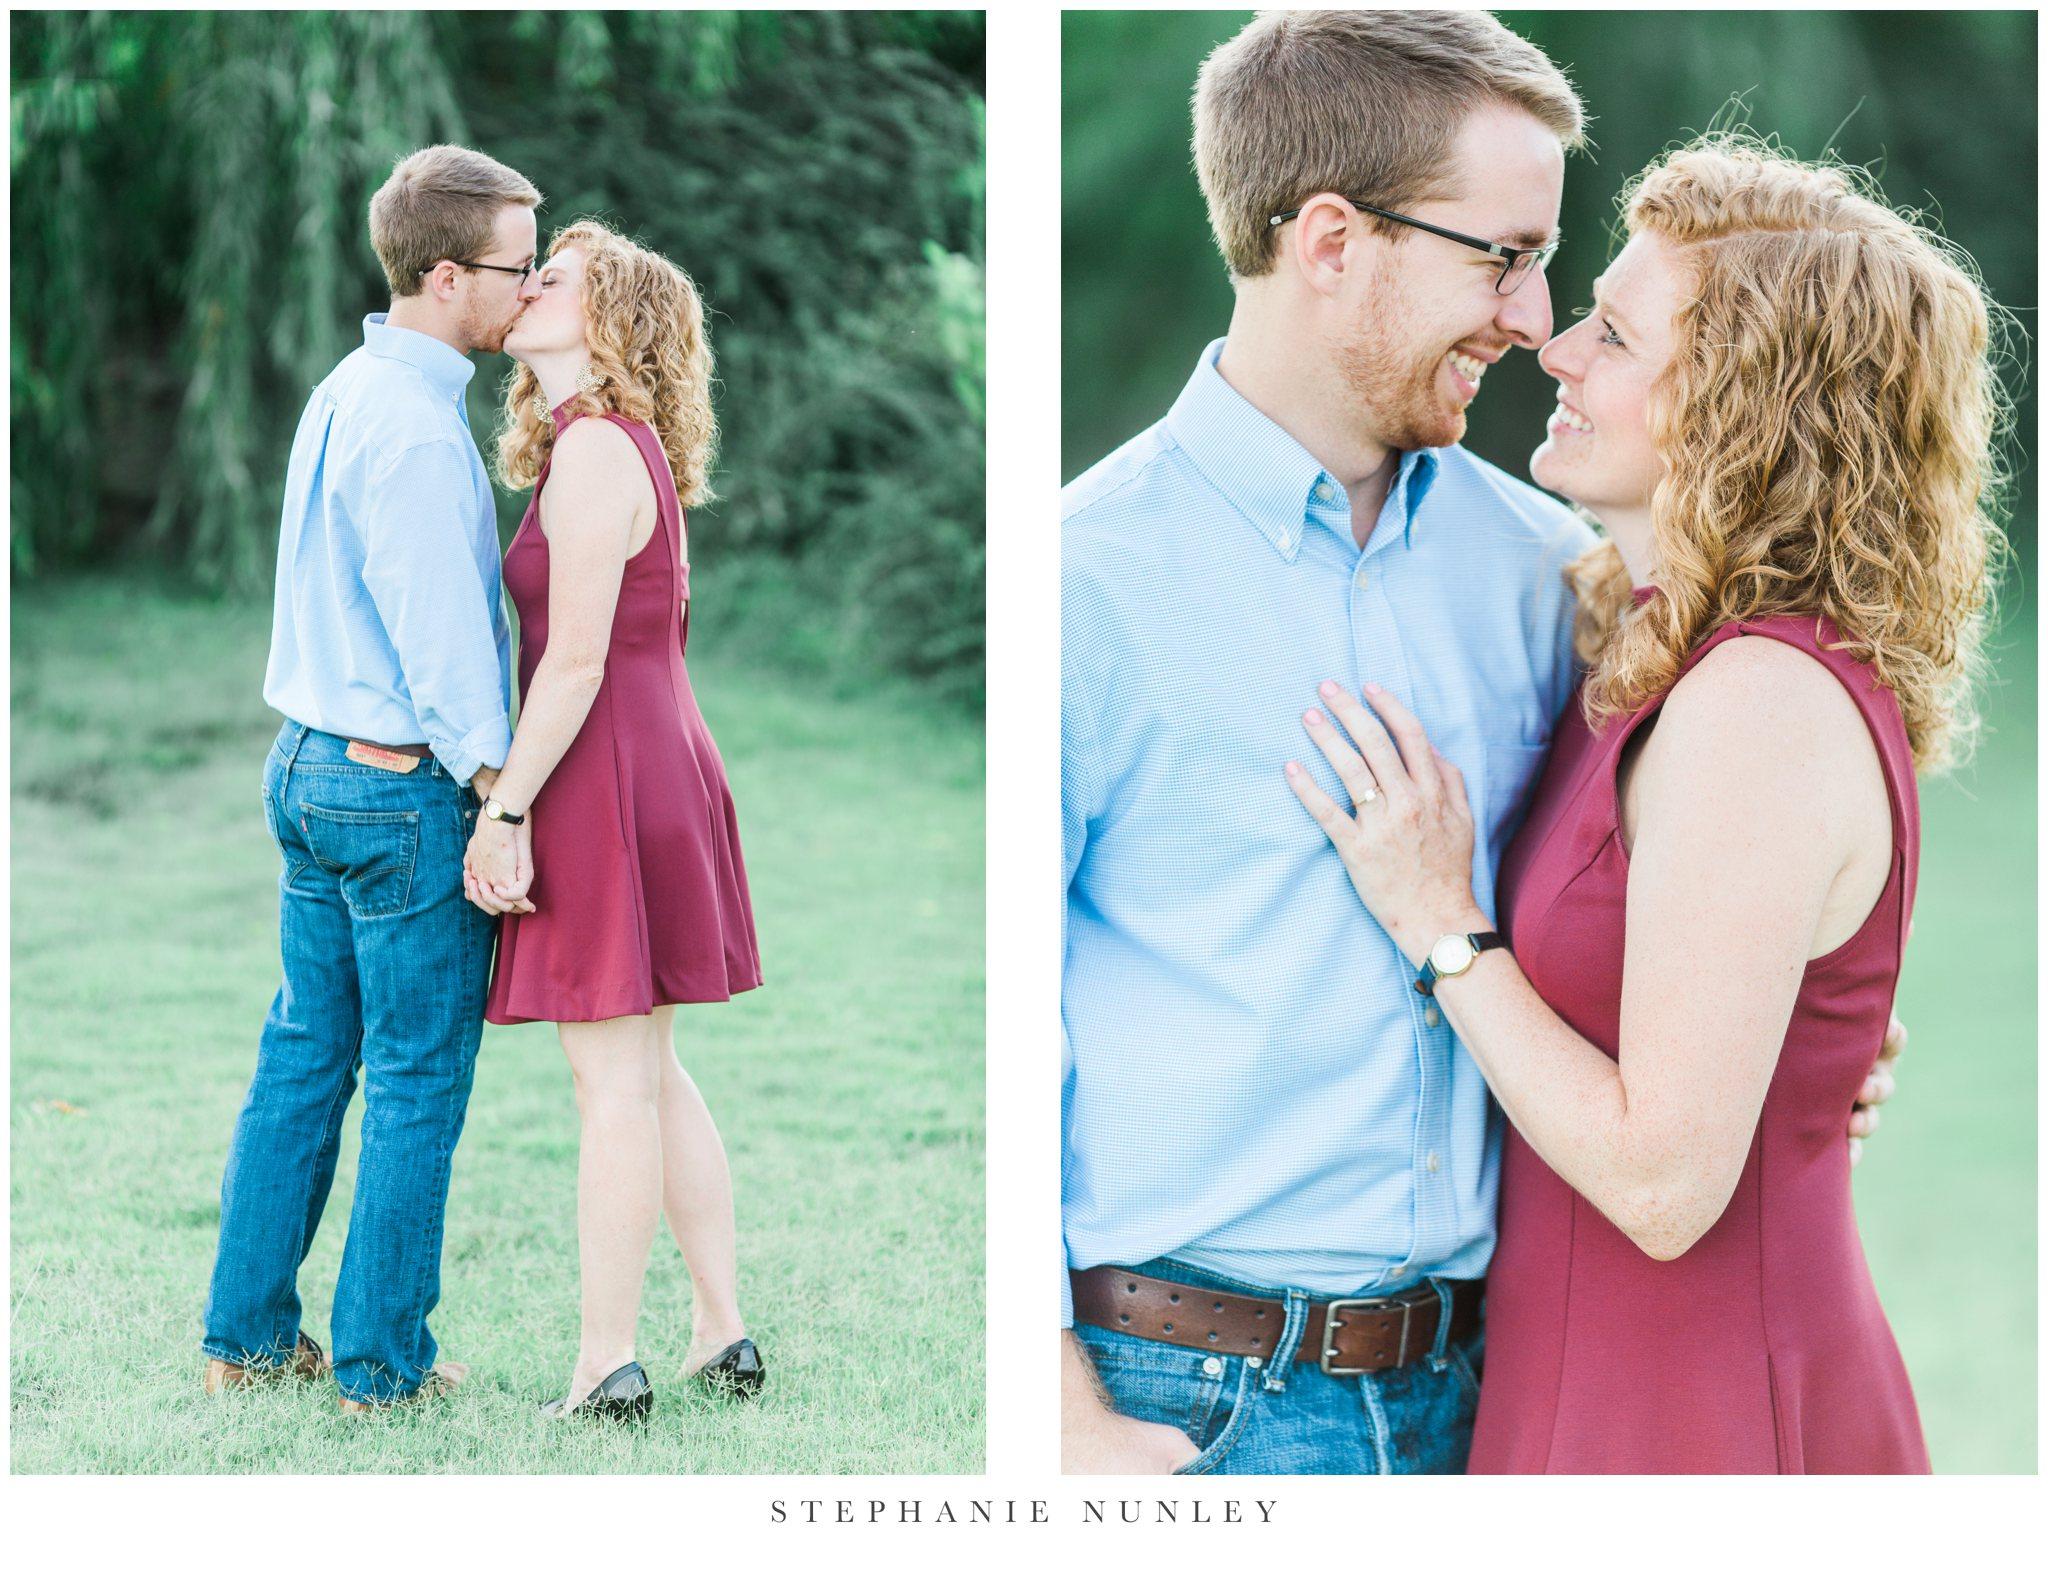 bentonville-arkansas-classic-engagement-photos-0022.jpg